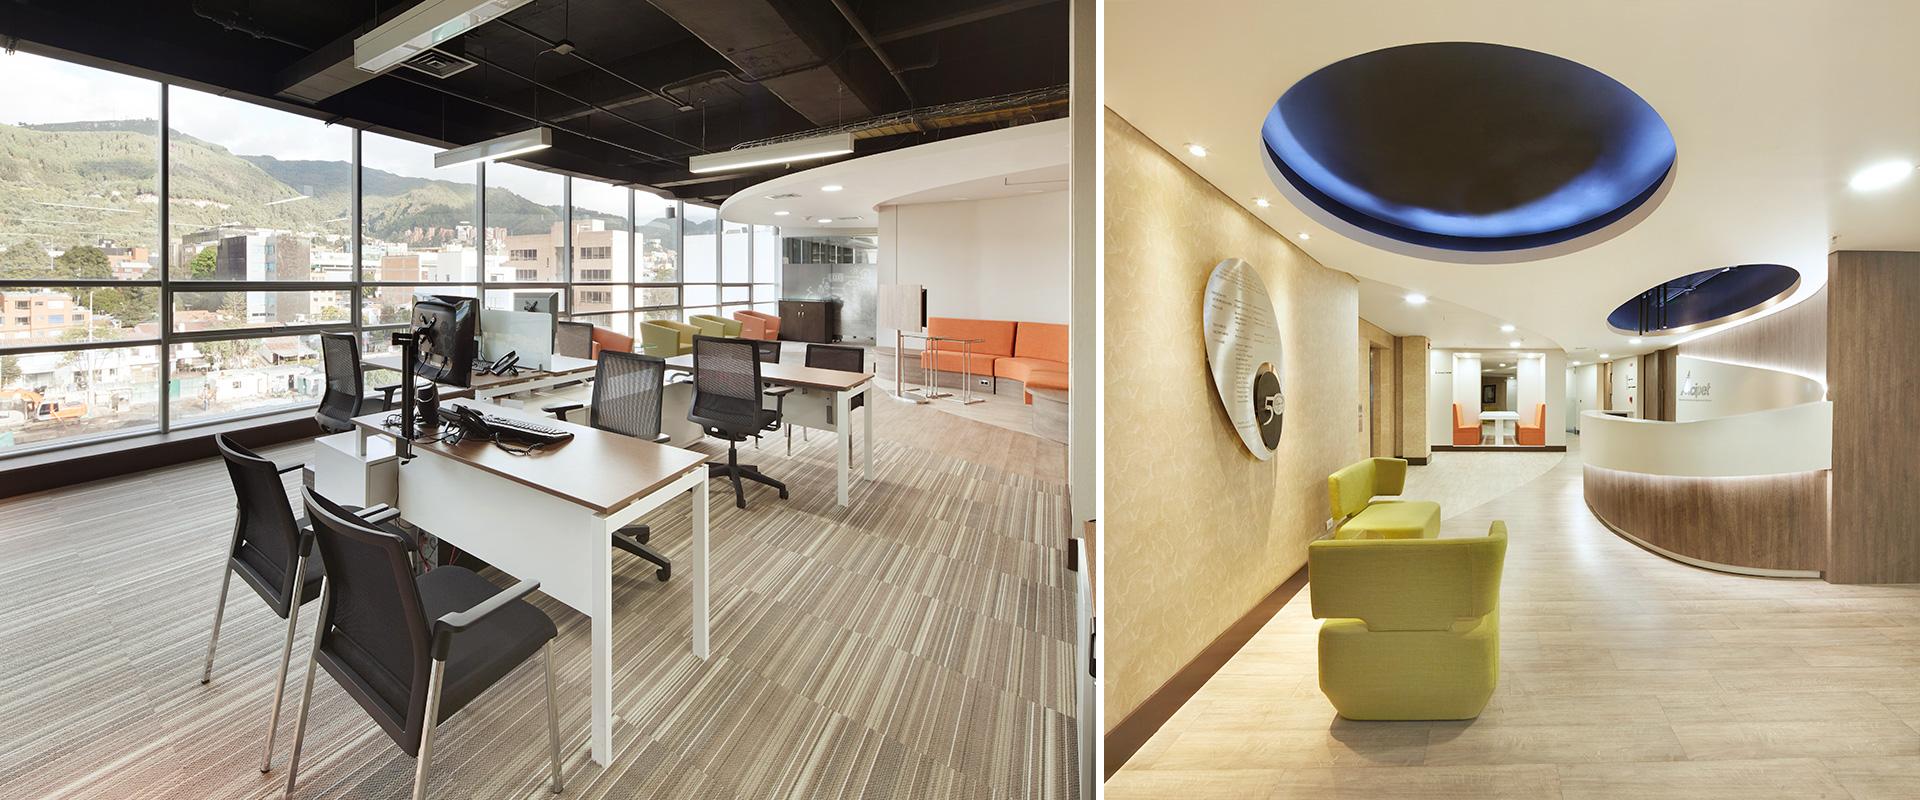 Dise o de interiores y remodelaci n oficina acipent for Diseno oficinas modernas bogota